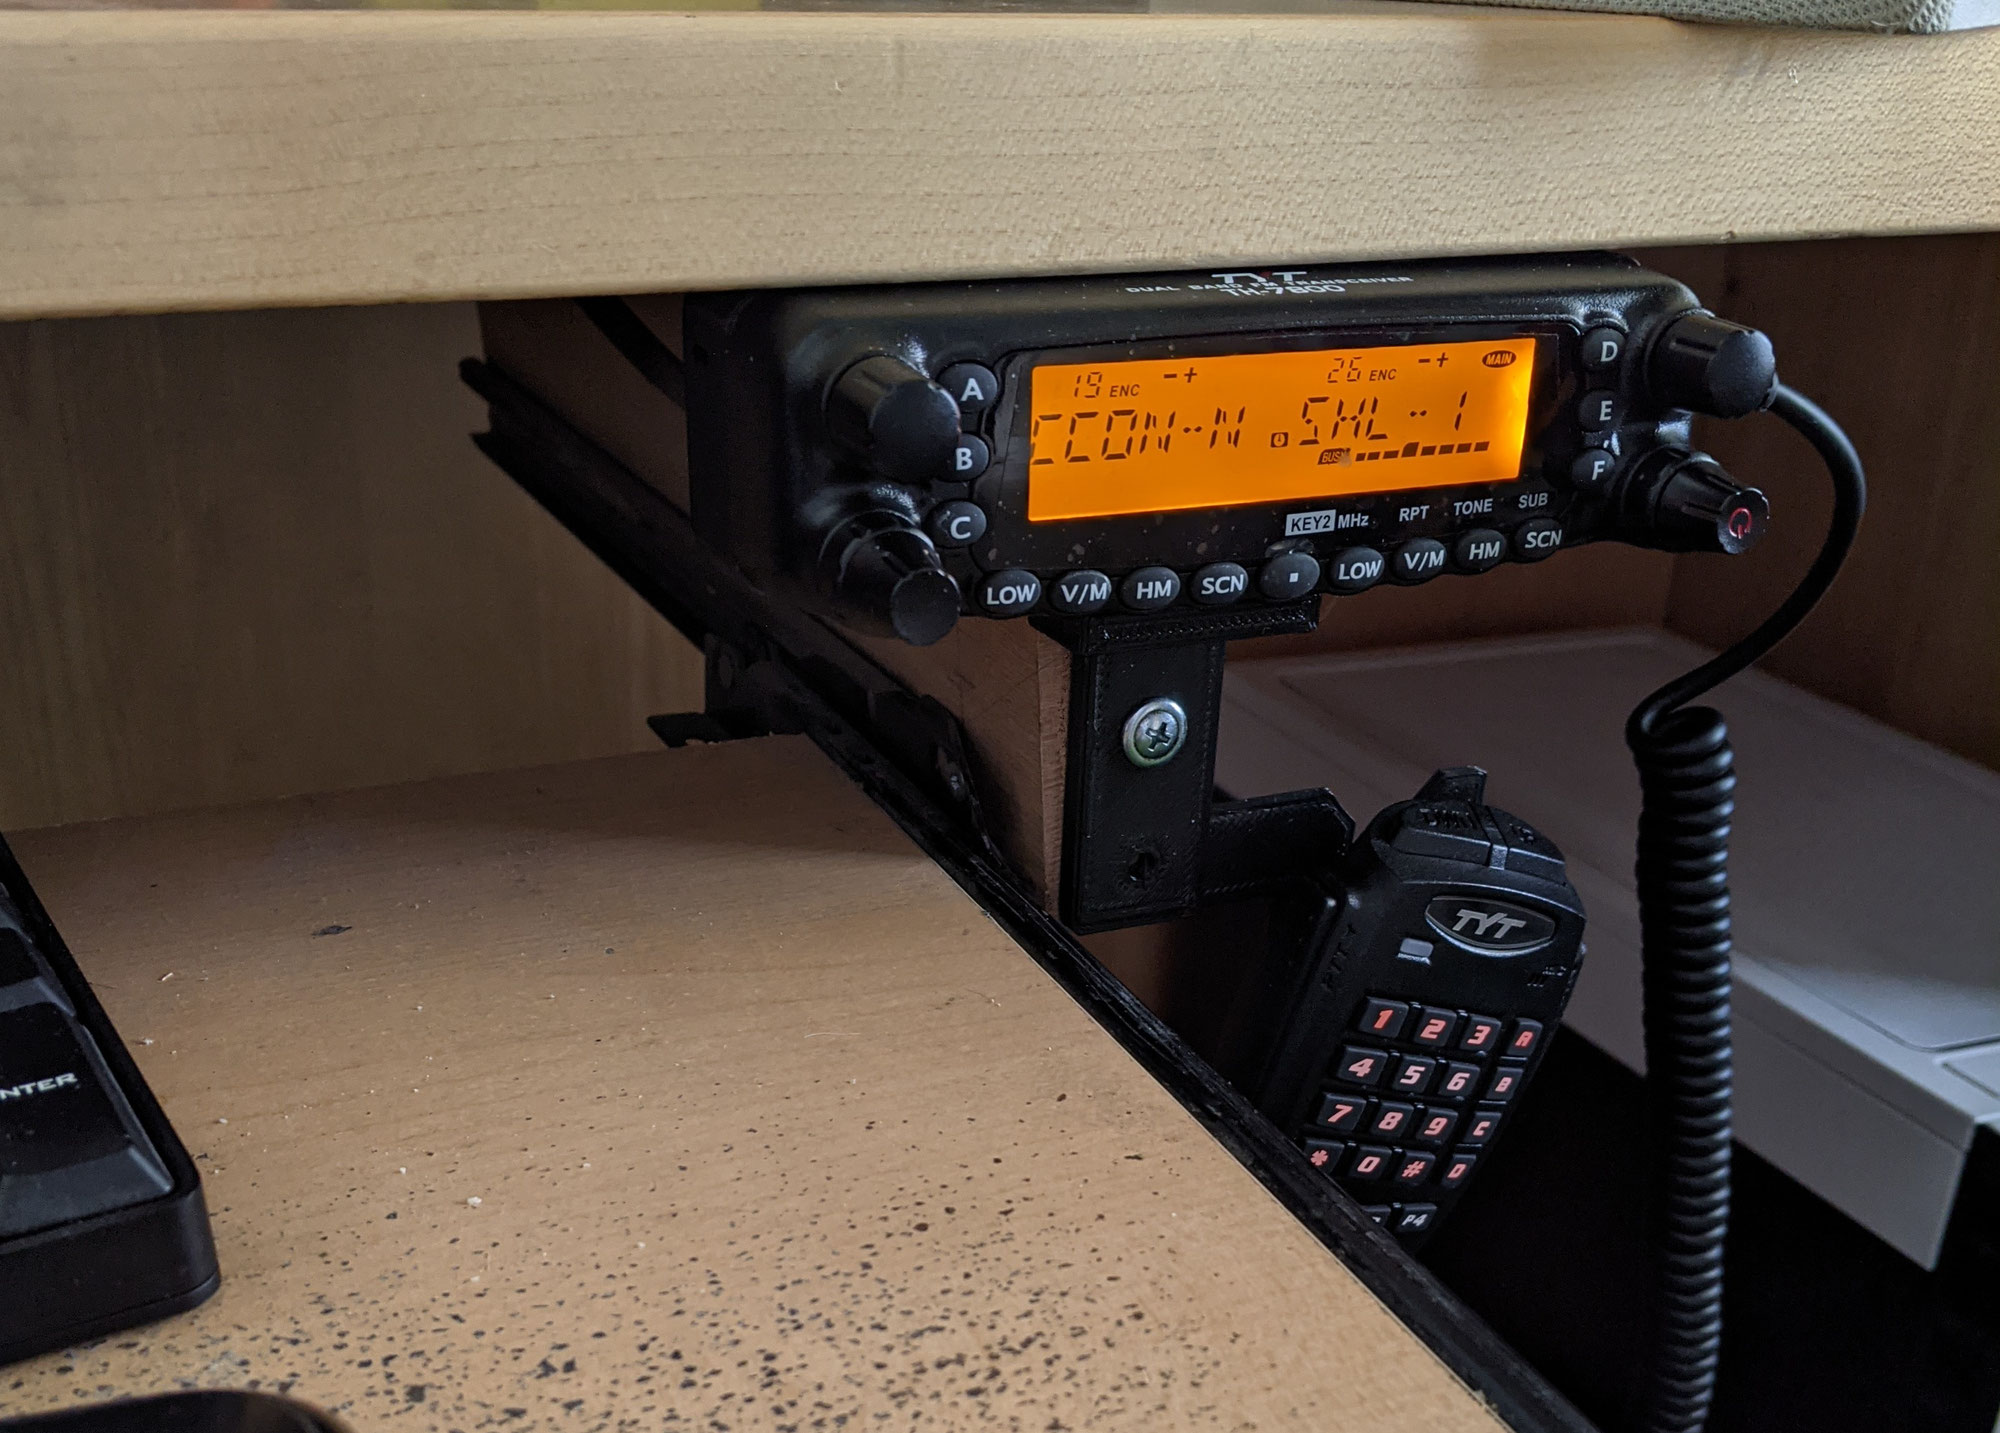 The budget friendly TYT TH-7800 Dual Band Radio